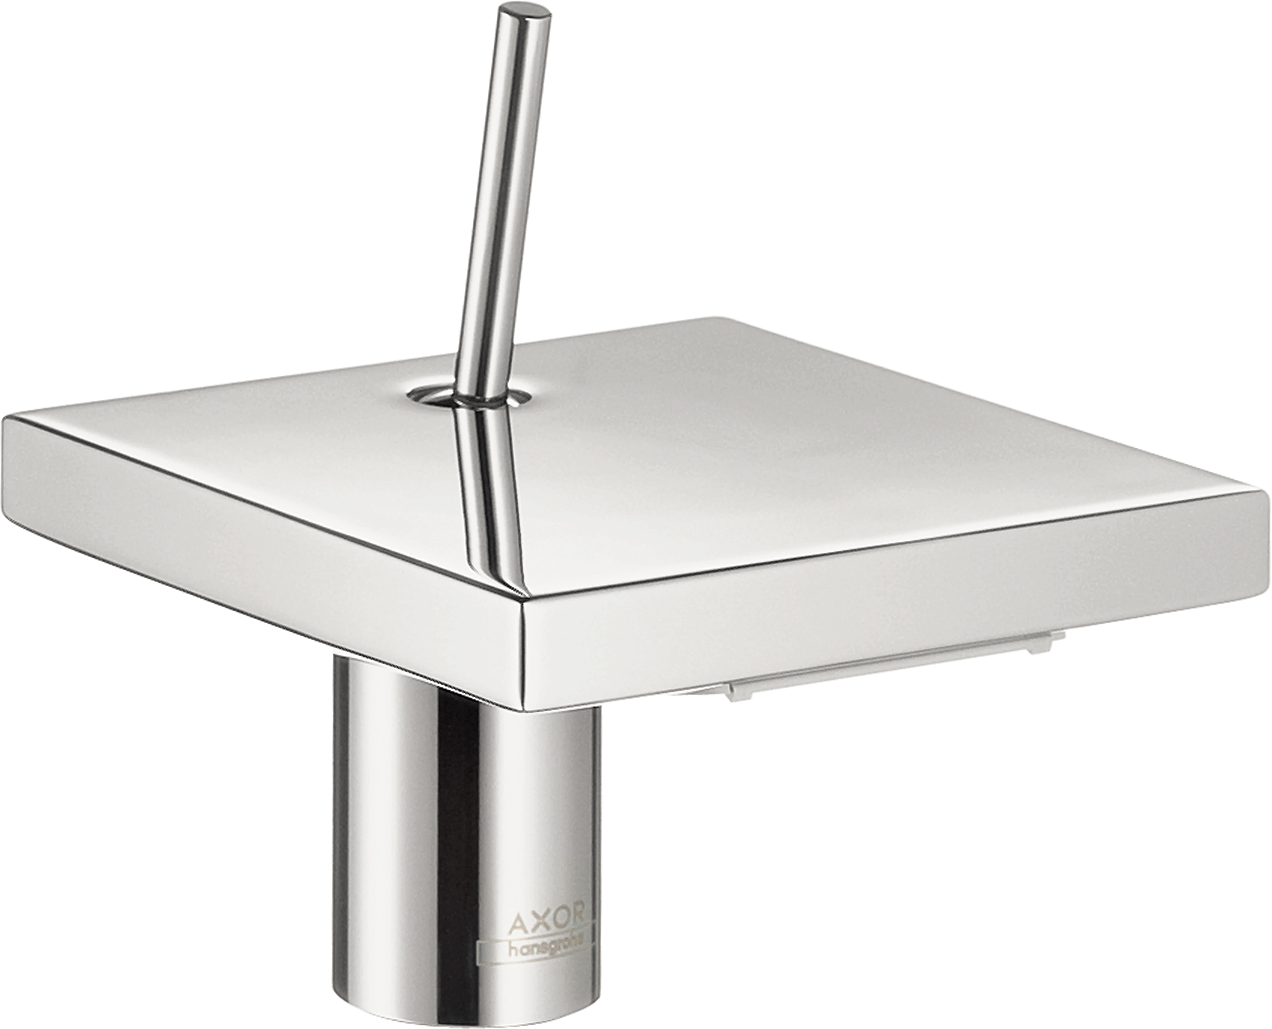 Axor AXOR Starck X Single-Hole Faucet, 1.2 GPM